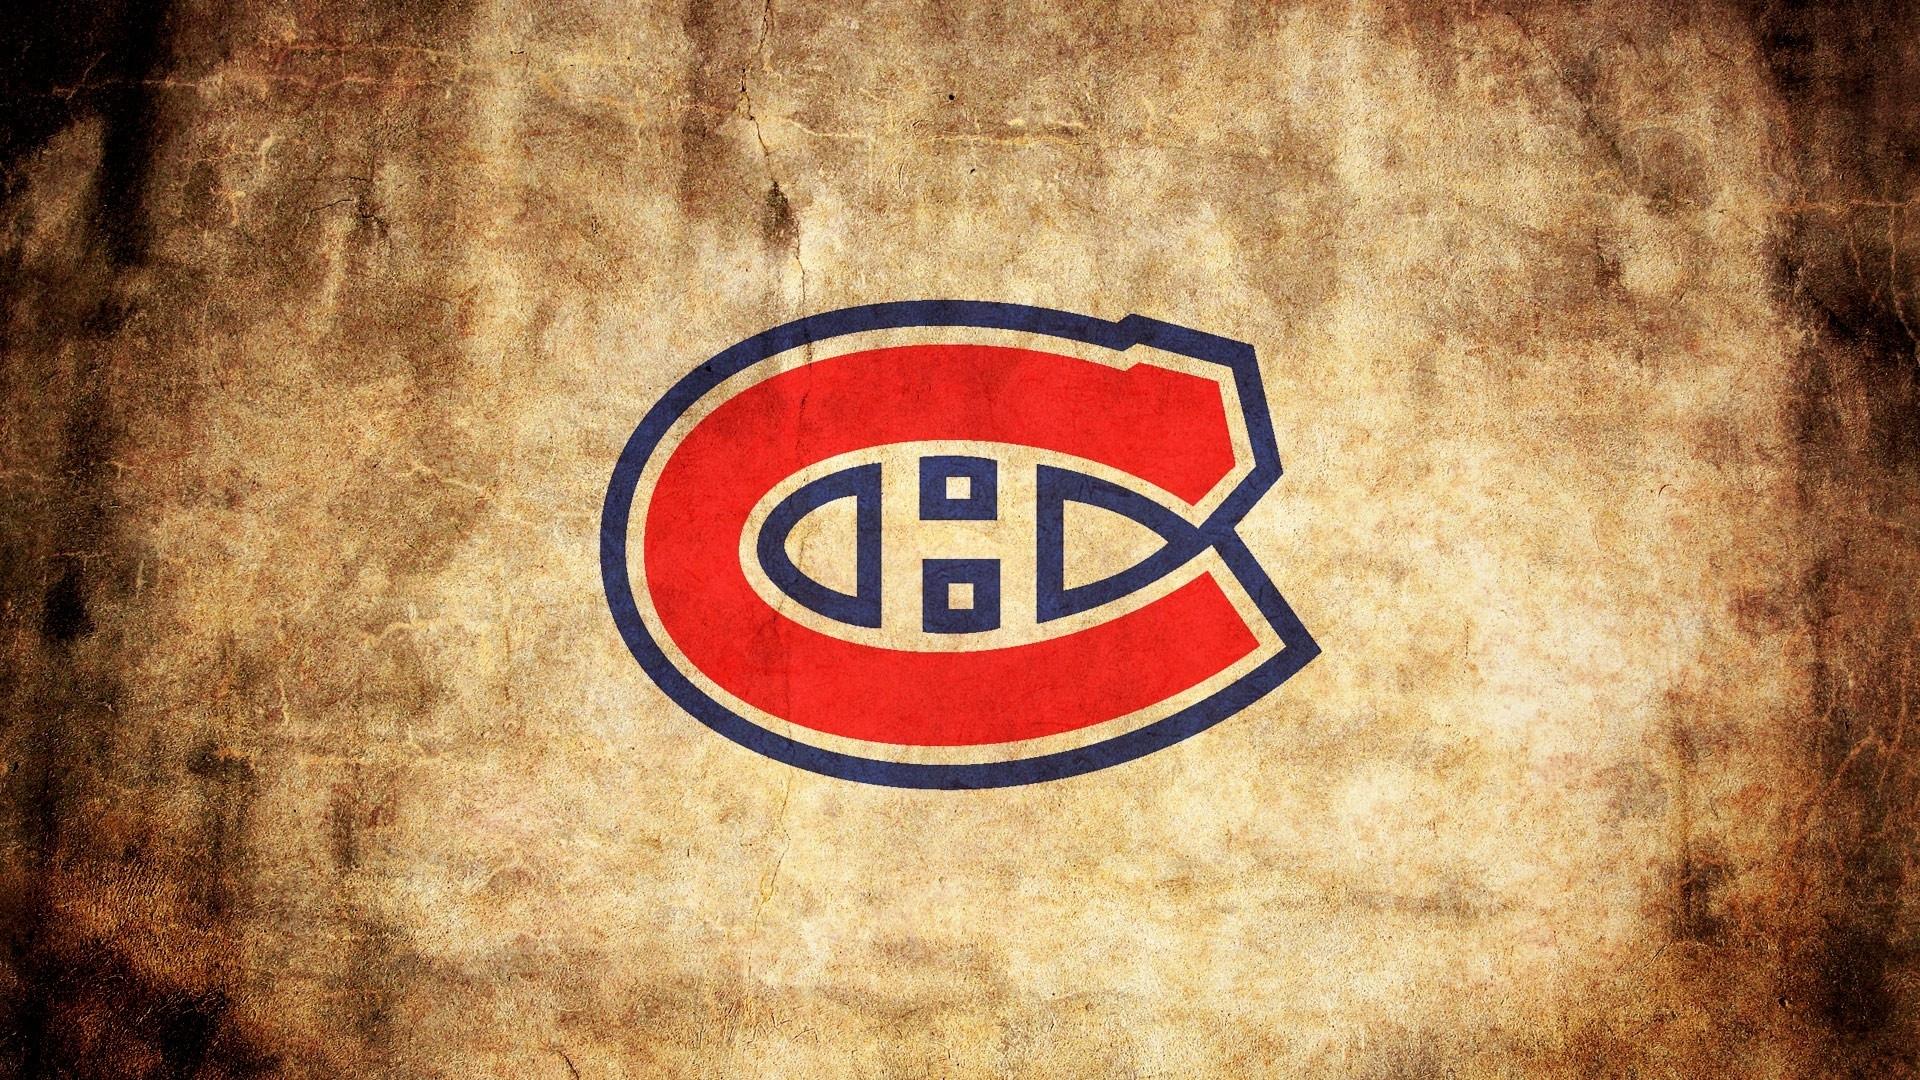 Canada hockey montreal quebec canadiens wallpaper 1920x1080 128584 1920x1080